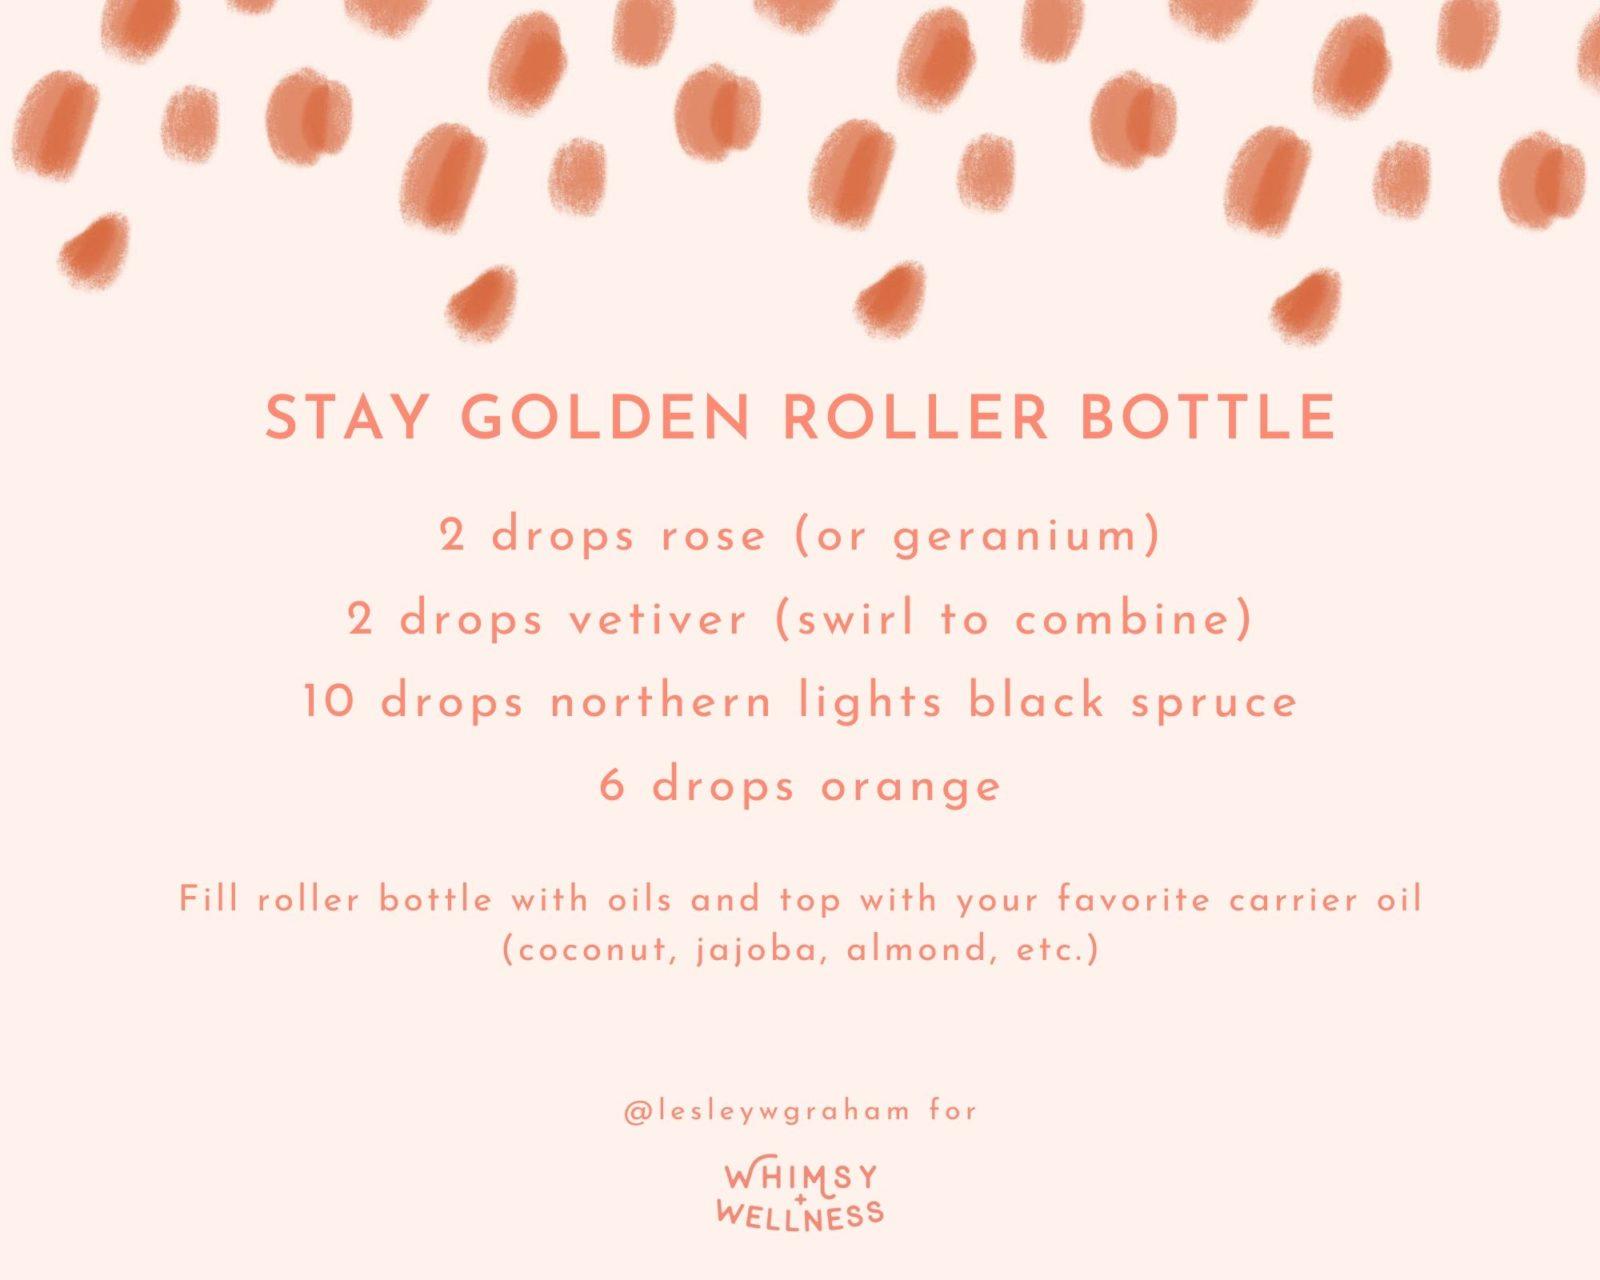 Stay Golden Roller Bottle Blend Lesley W Graham Young Living Crown Diamond Whimsy + Wellness